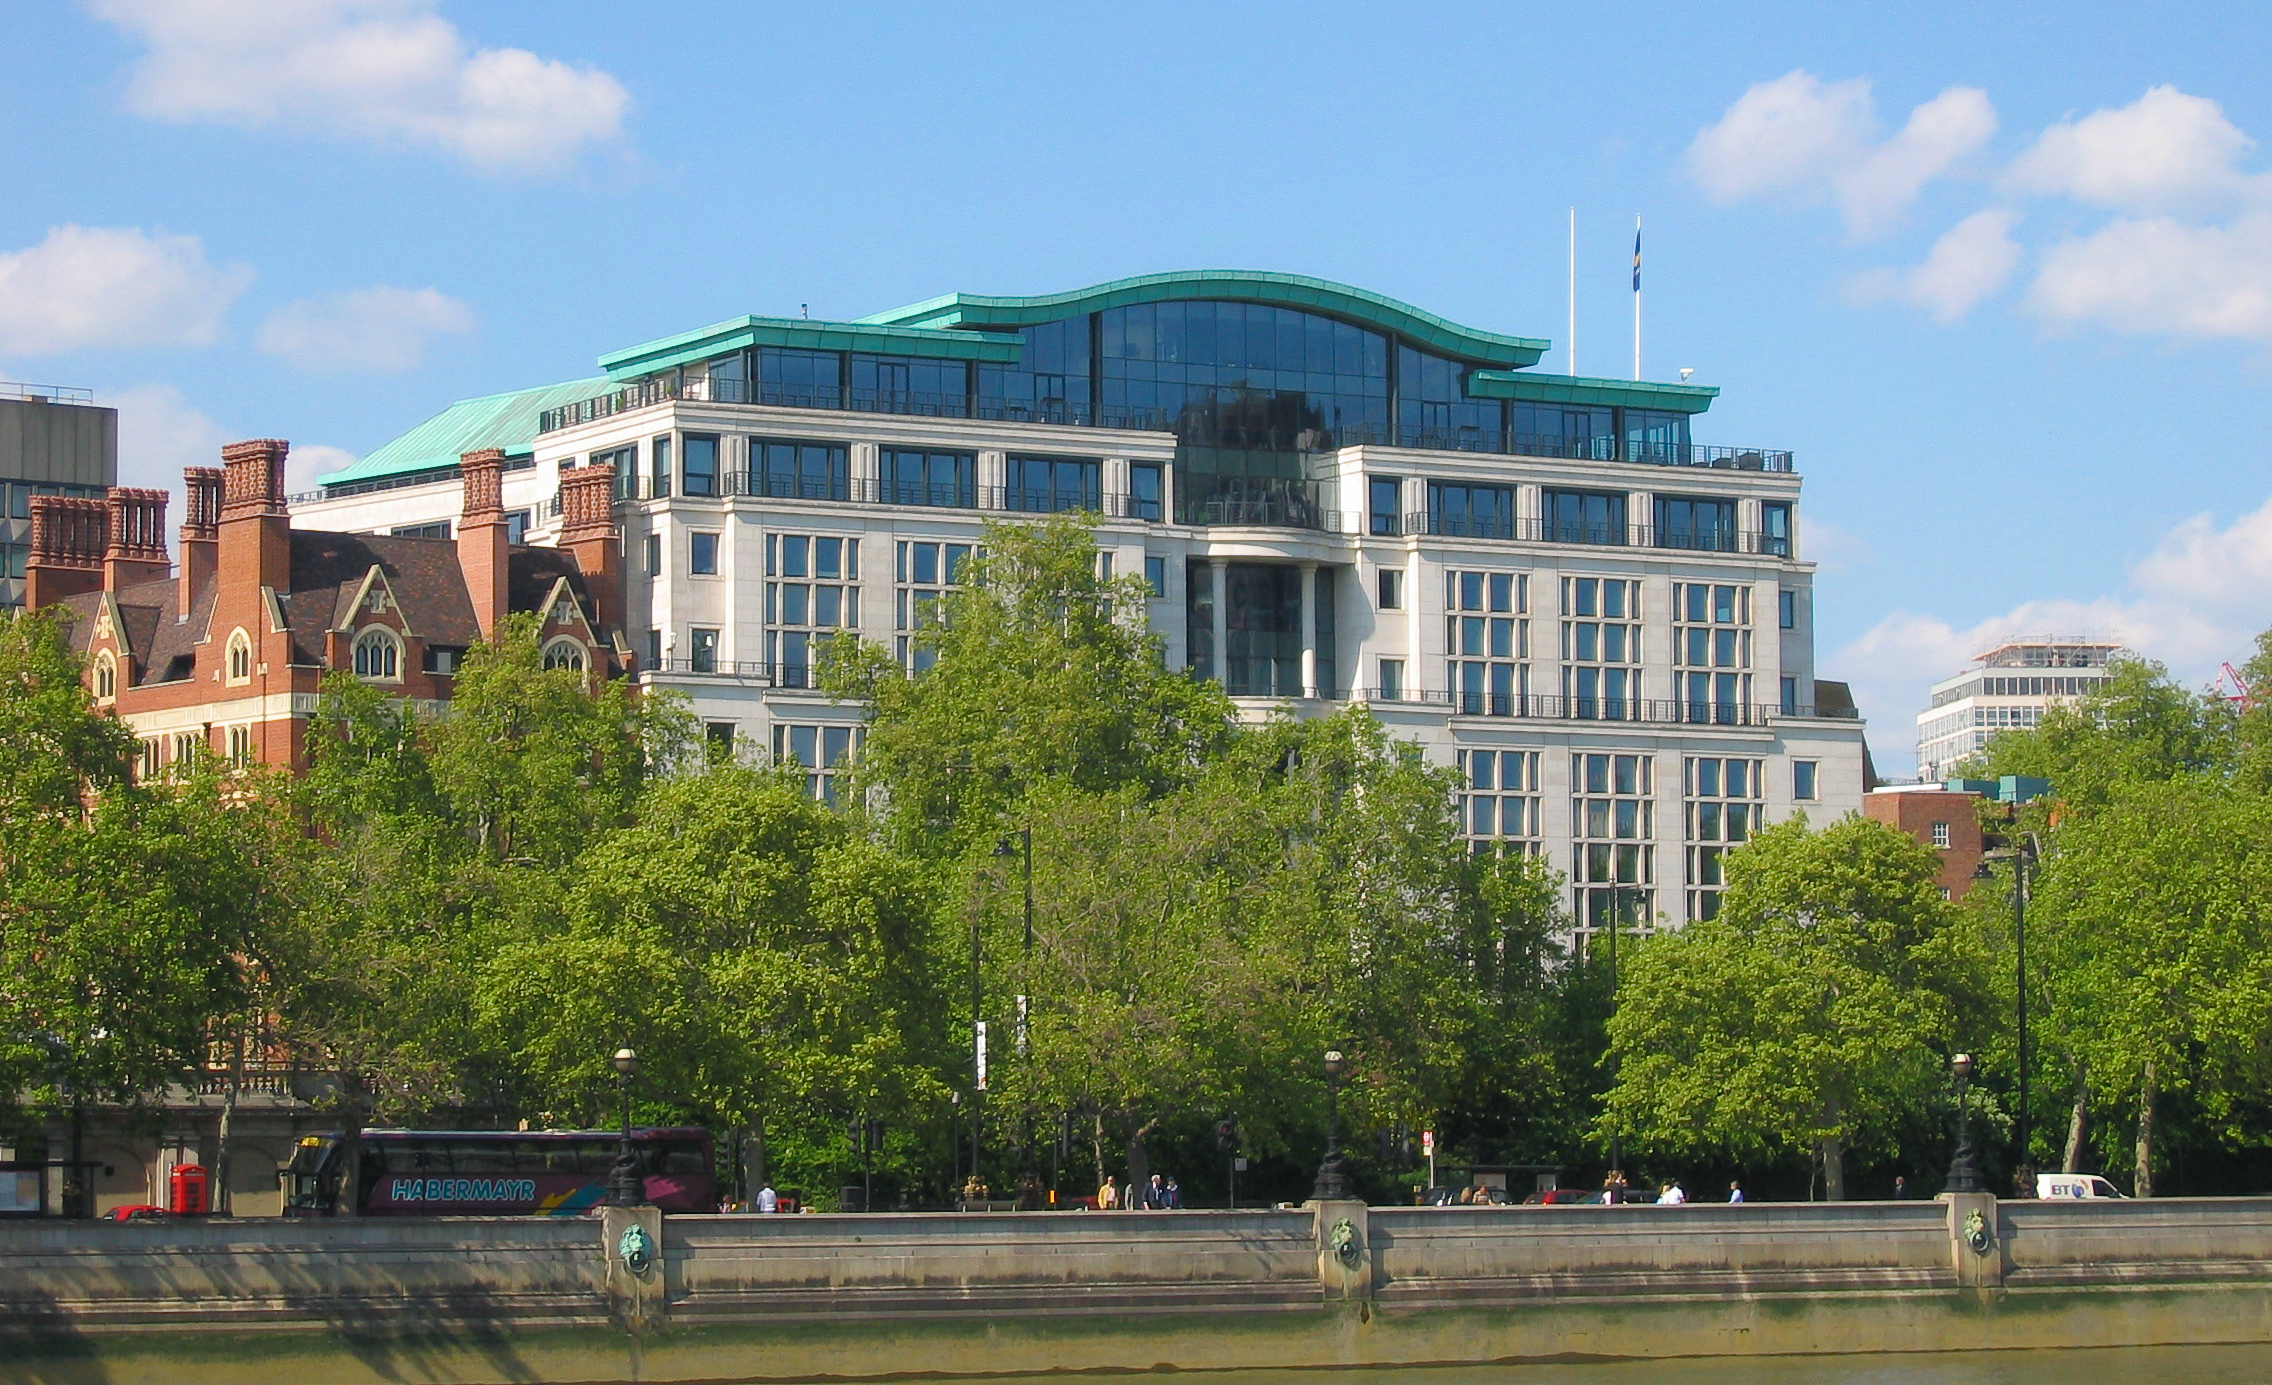 File:British American Tobacco Headquarters jpg - Wikimedia